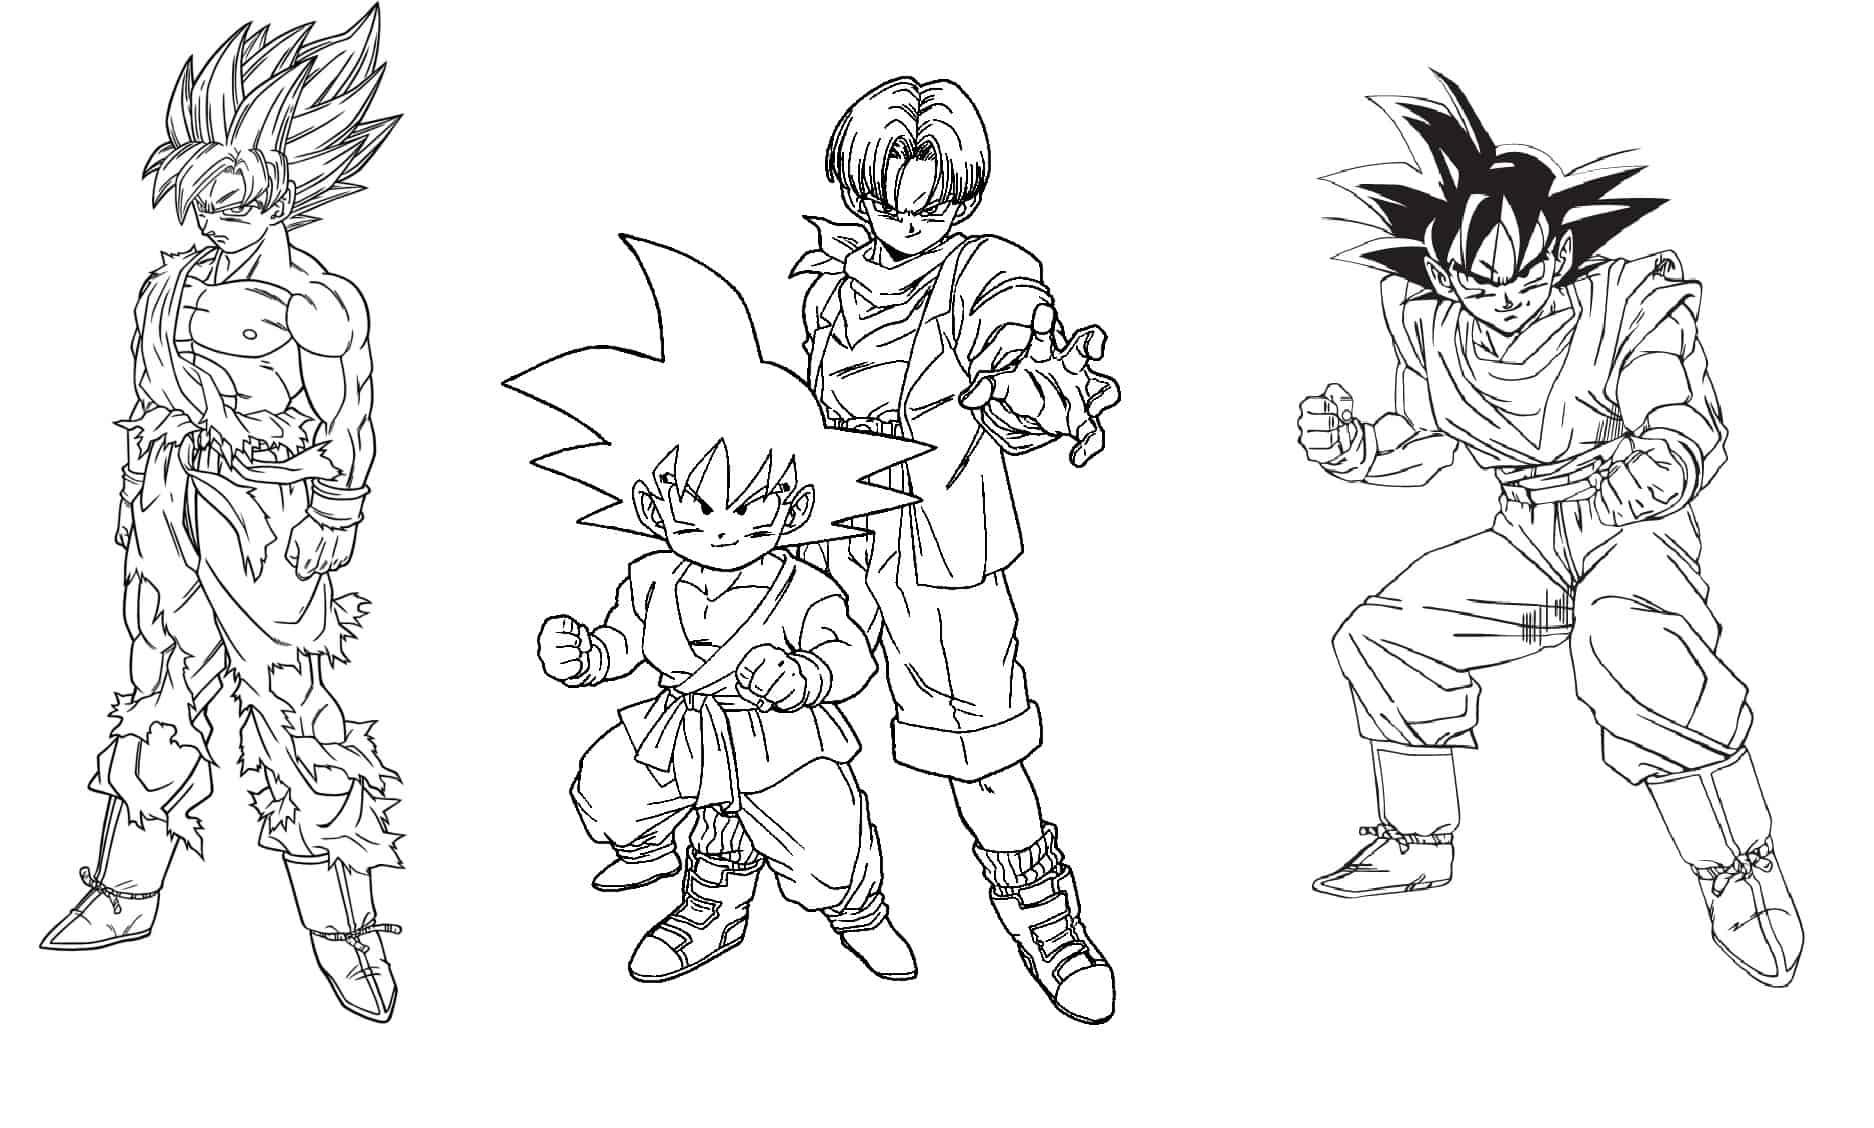 39 Desenhos Do Dragon Ball Z Para Colorir E Imprimir Gratis